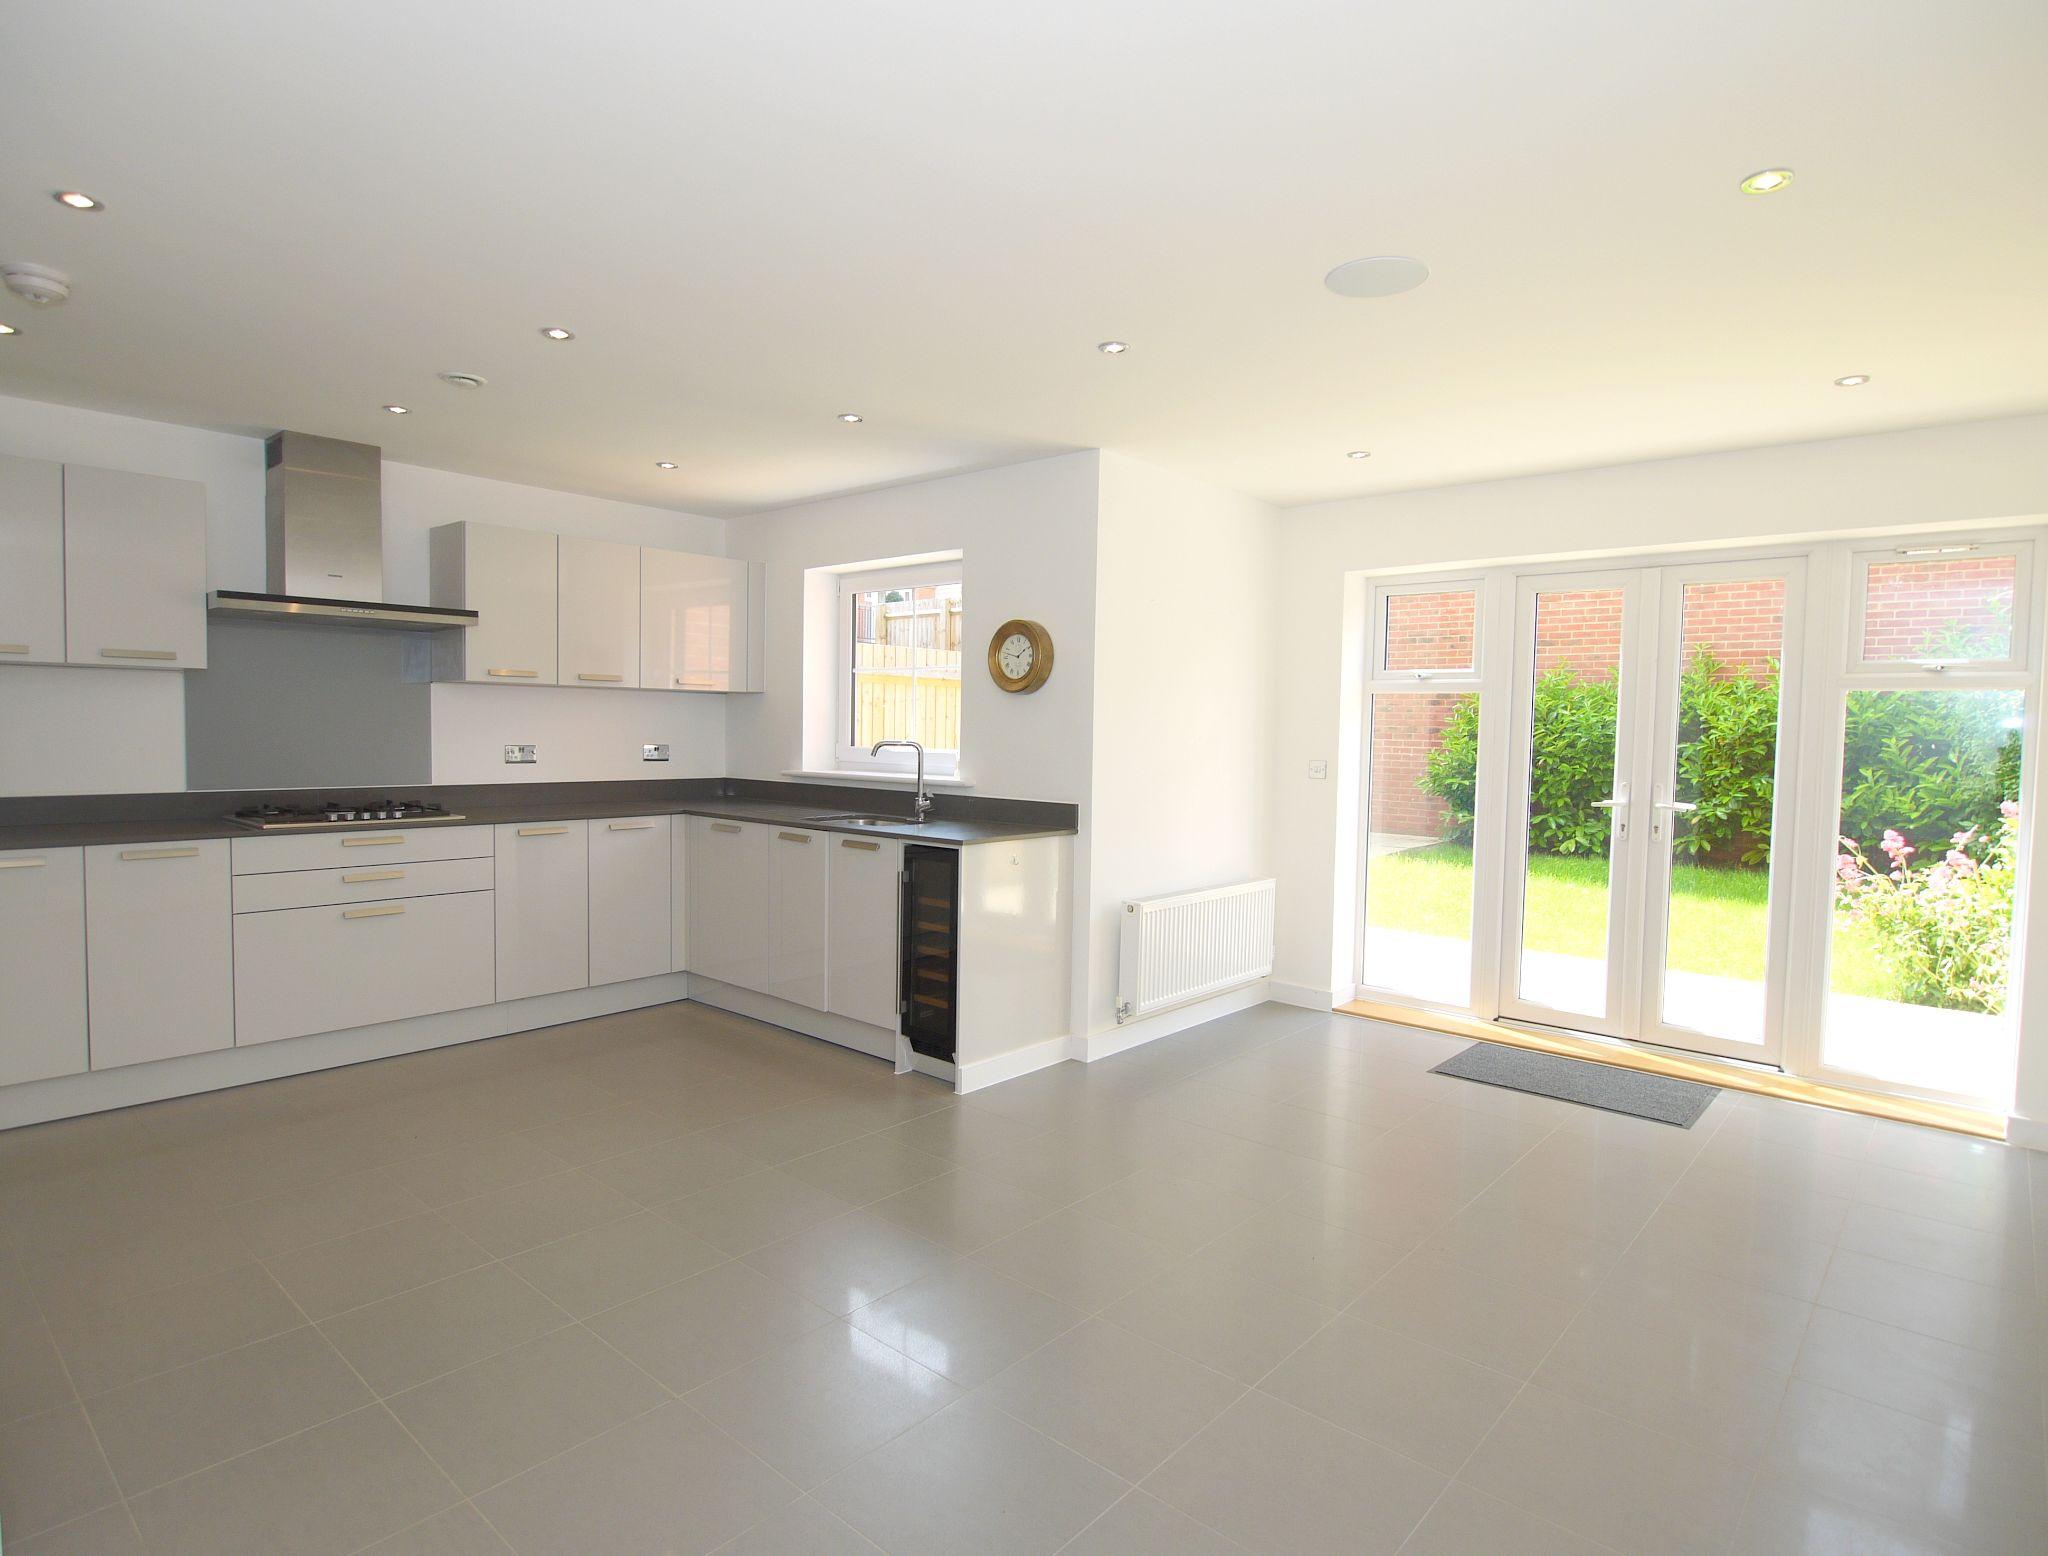 4 bedroom mid terraced house For Sale in Sevenoaks - Photograph 2